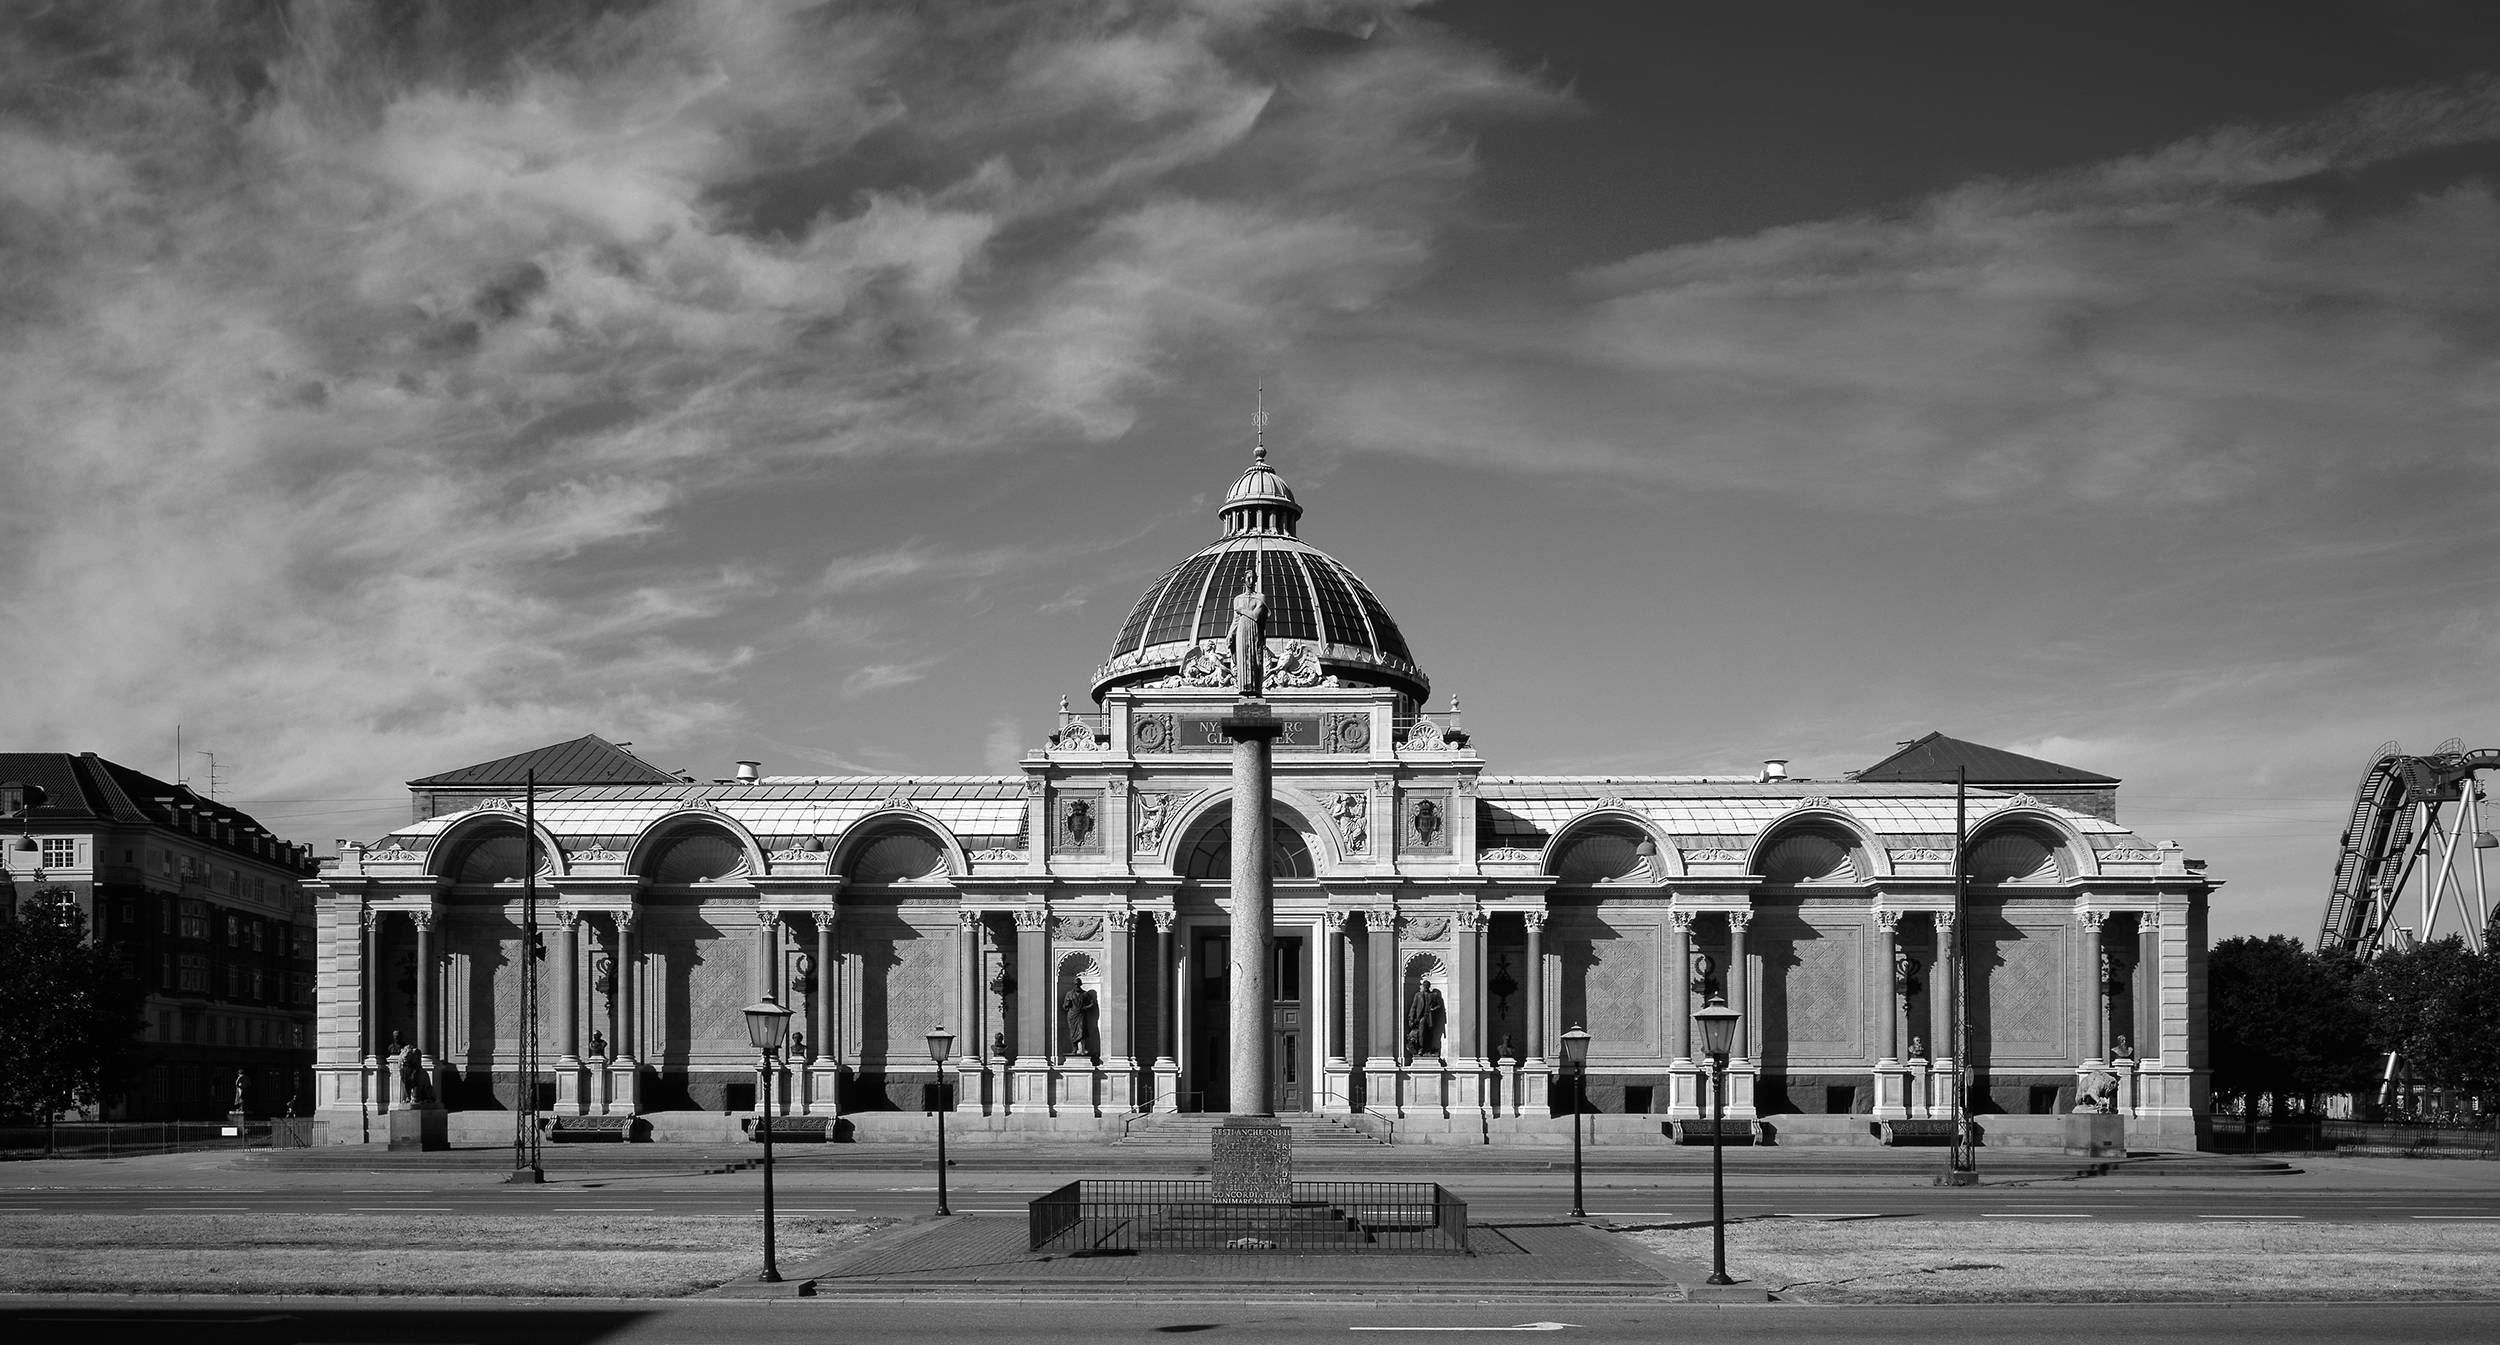 Beautiful Architecture Award, The City of Copenhagen 2006   For the restoration of  Ny Carlsberg Glyptotek .